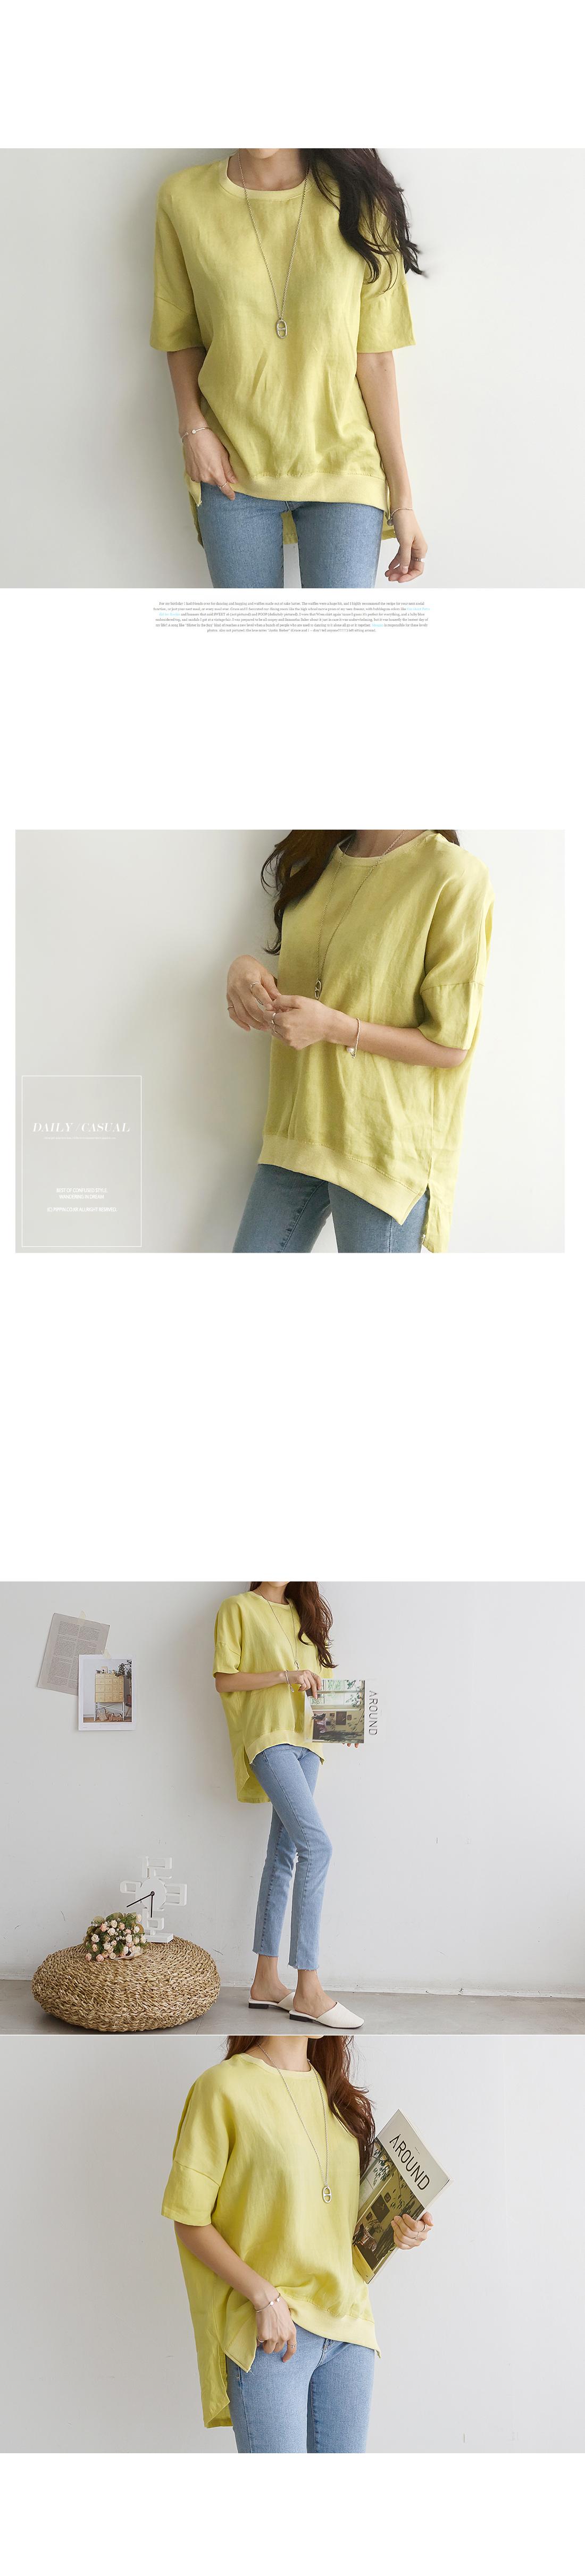 Slit linen T-shirt #105915F available